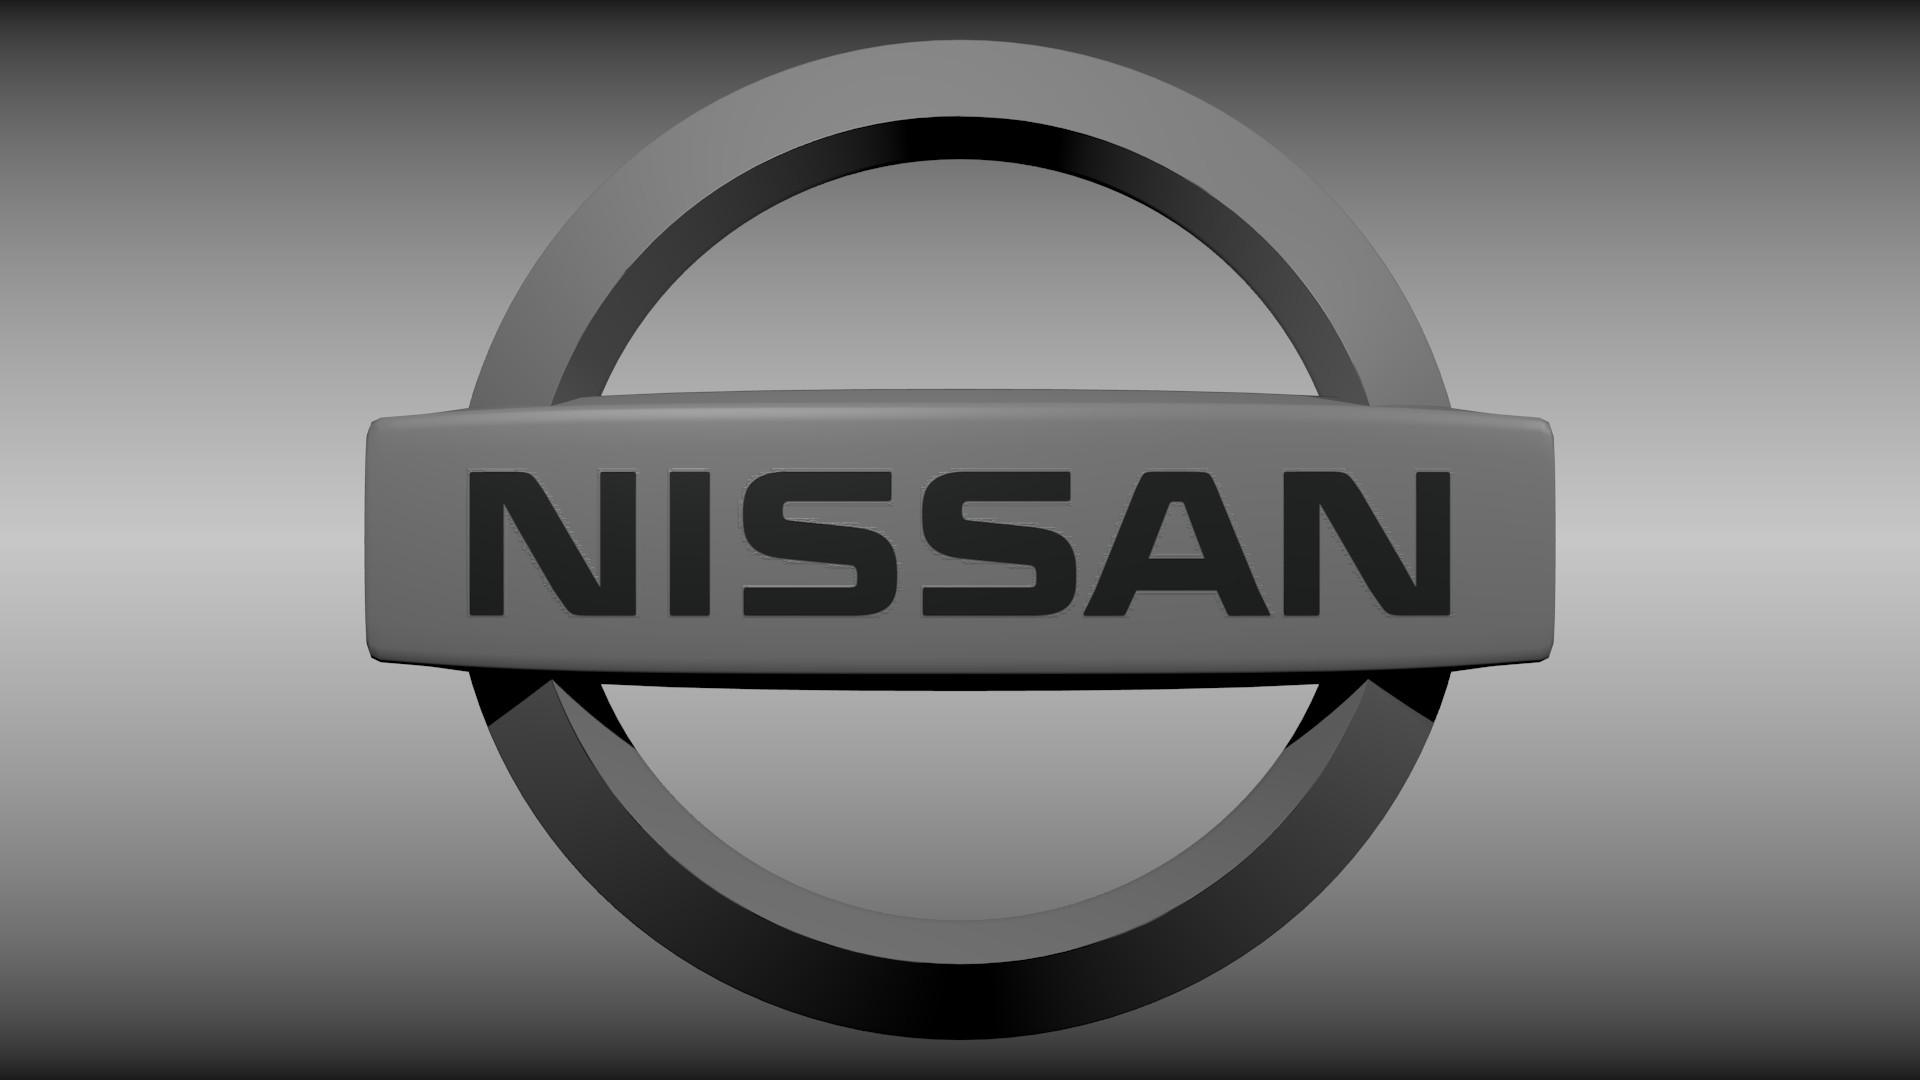 nissan titan truck logo wallpapers, nissan tita